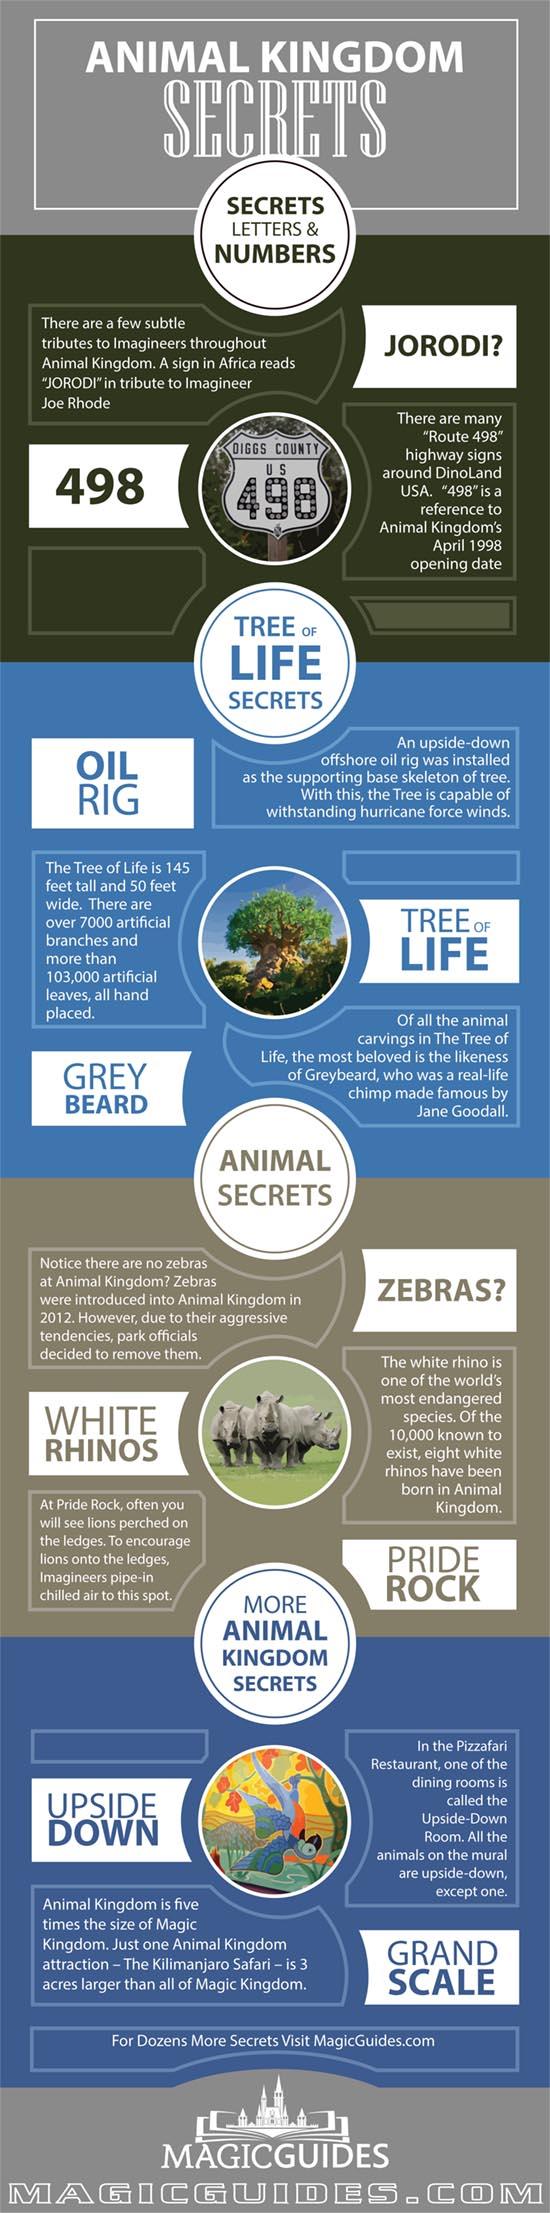 animal kingdom secrets